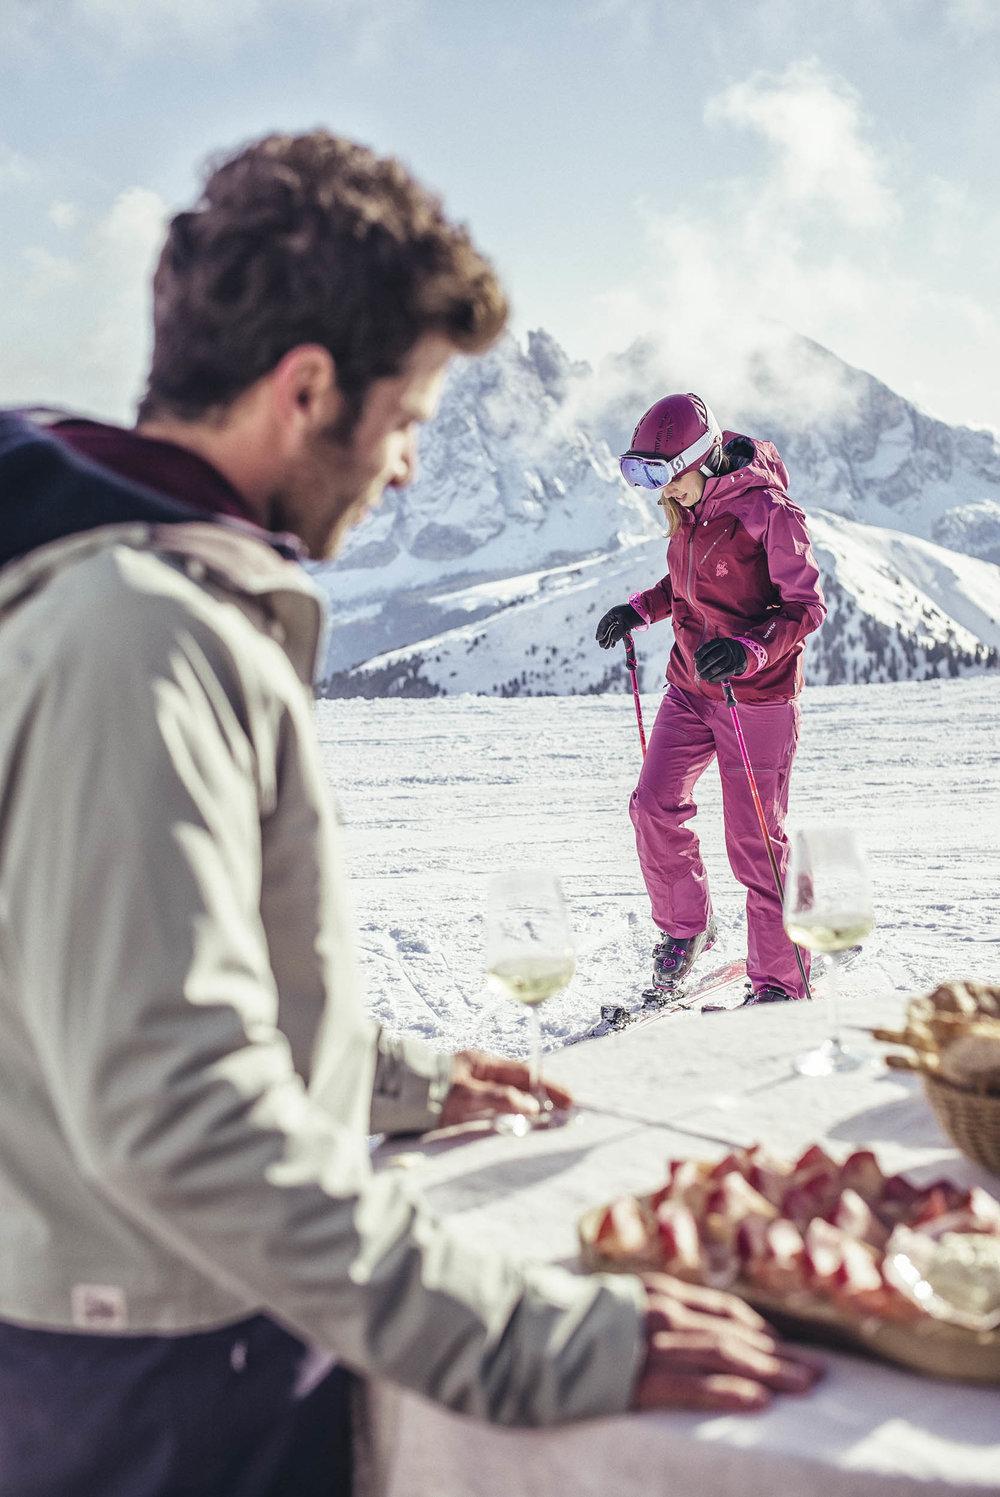 seifertuebler-lifestyle-suedtirol-winter-tourism-ski-dolomites05.jpg